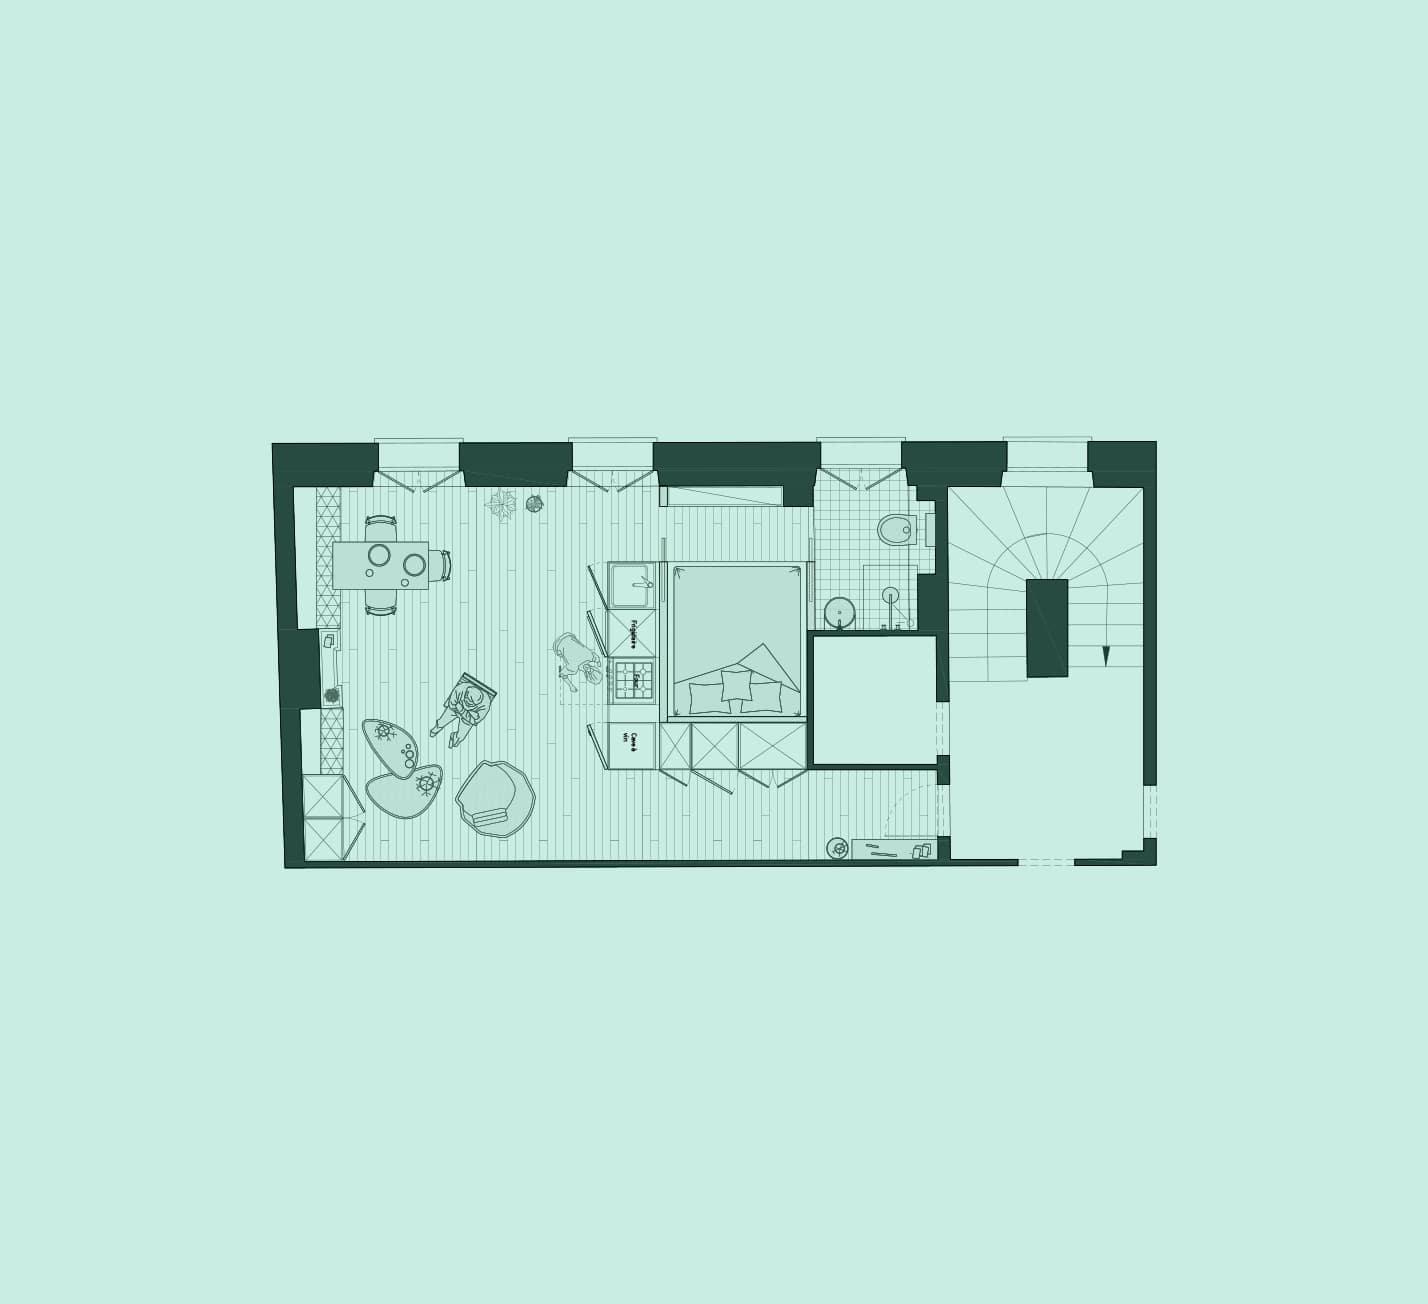 Appartement-Montmartre-Psd-dessins-02-min